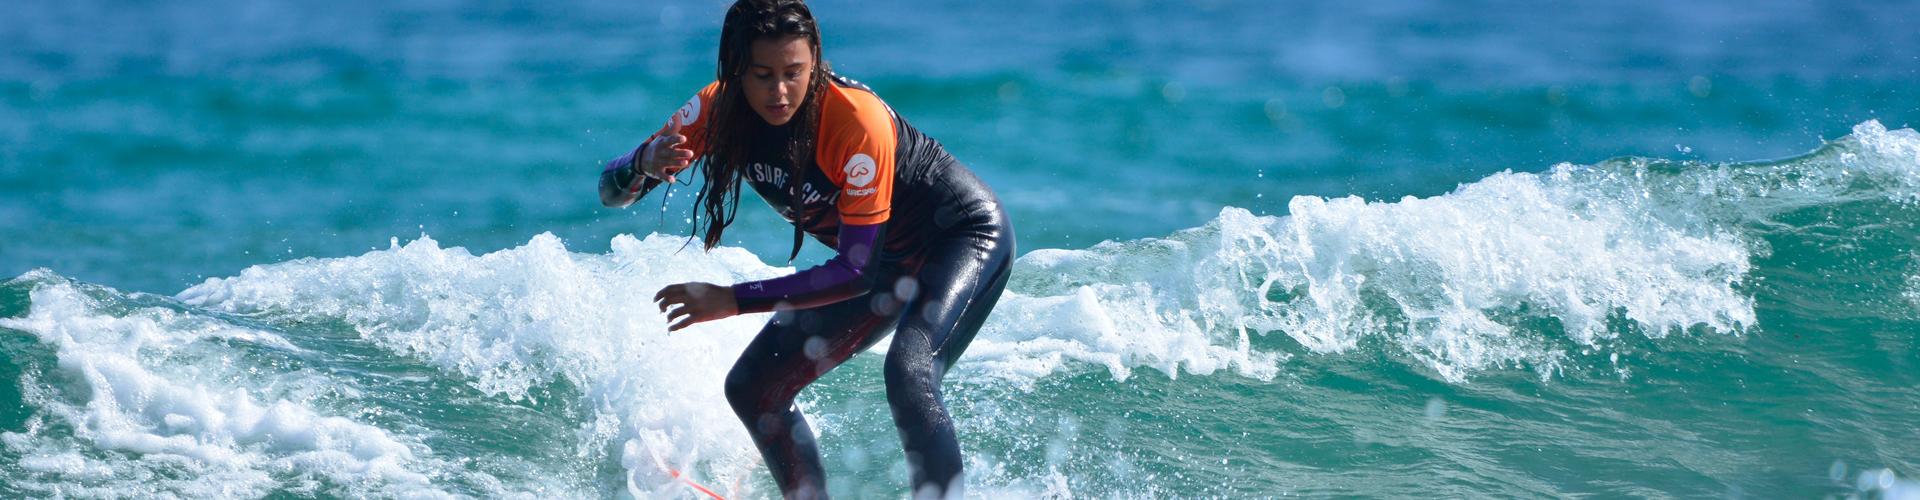 Reservas surf camp adultos septiembre